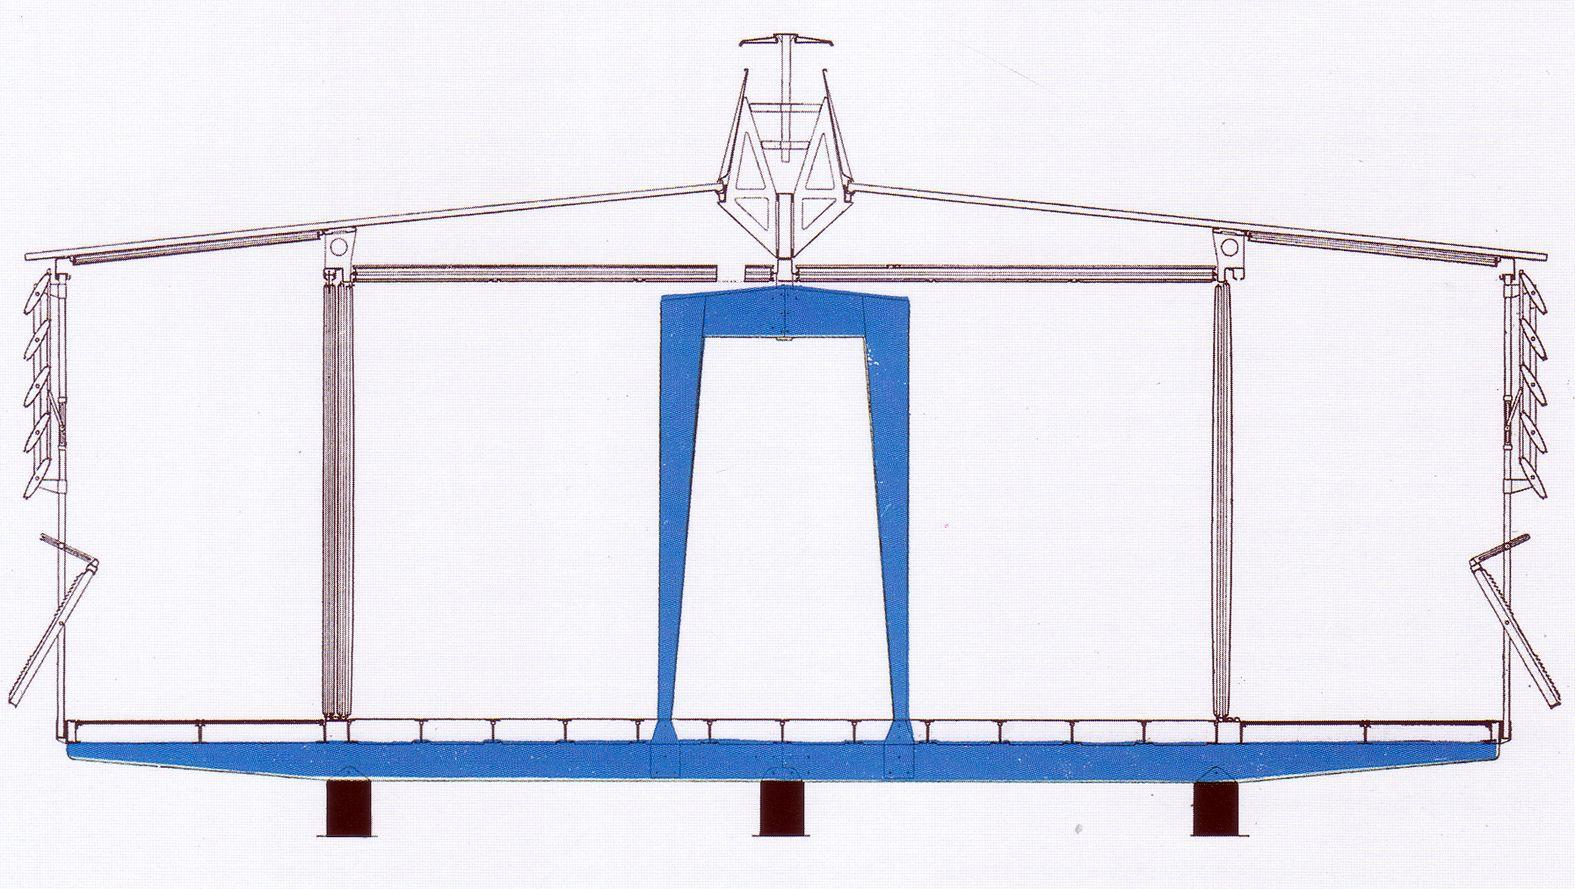 1951 maison pr fabriqu e type tropique 16x10 niamey secci n constructiva con los sistemas de. Black Bedroom Furniture Sets. Home Design Ideas